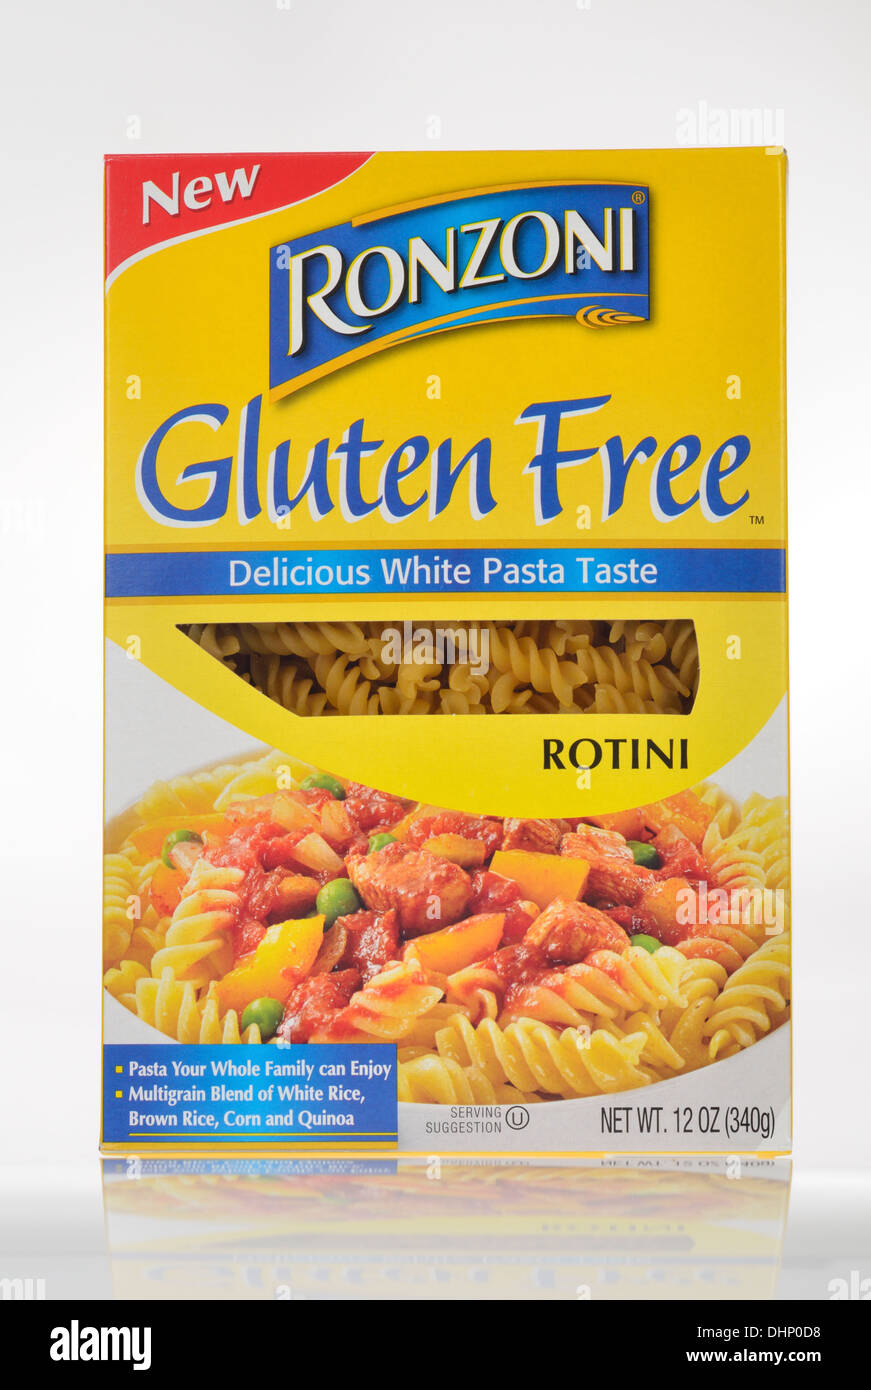 Unopened Box of Ronzoni Gluten Free pasta rotini on white background cutout. USA - Stock Image